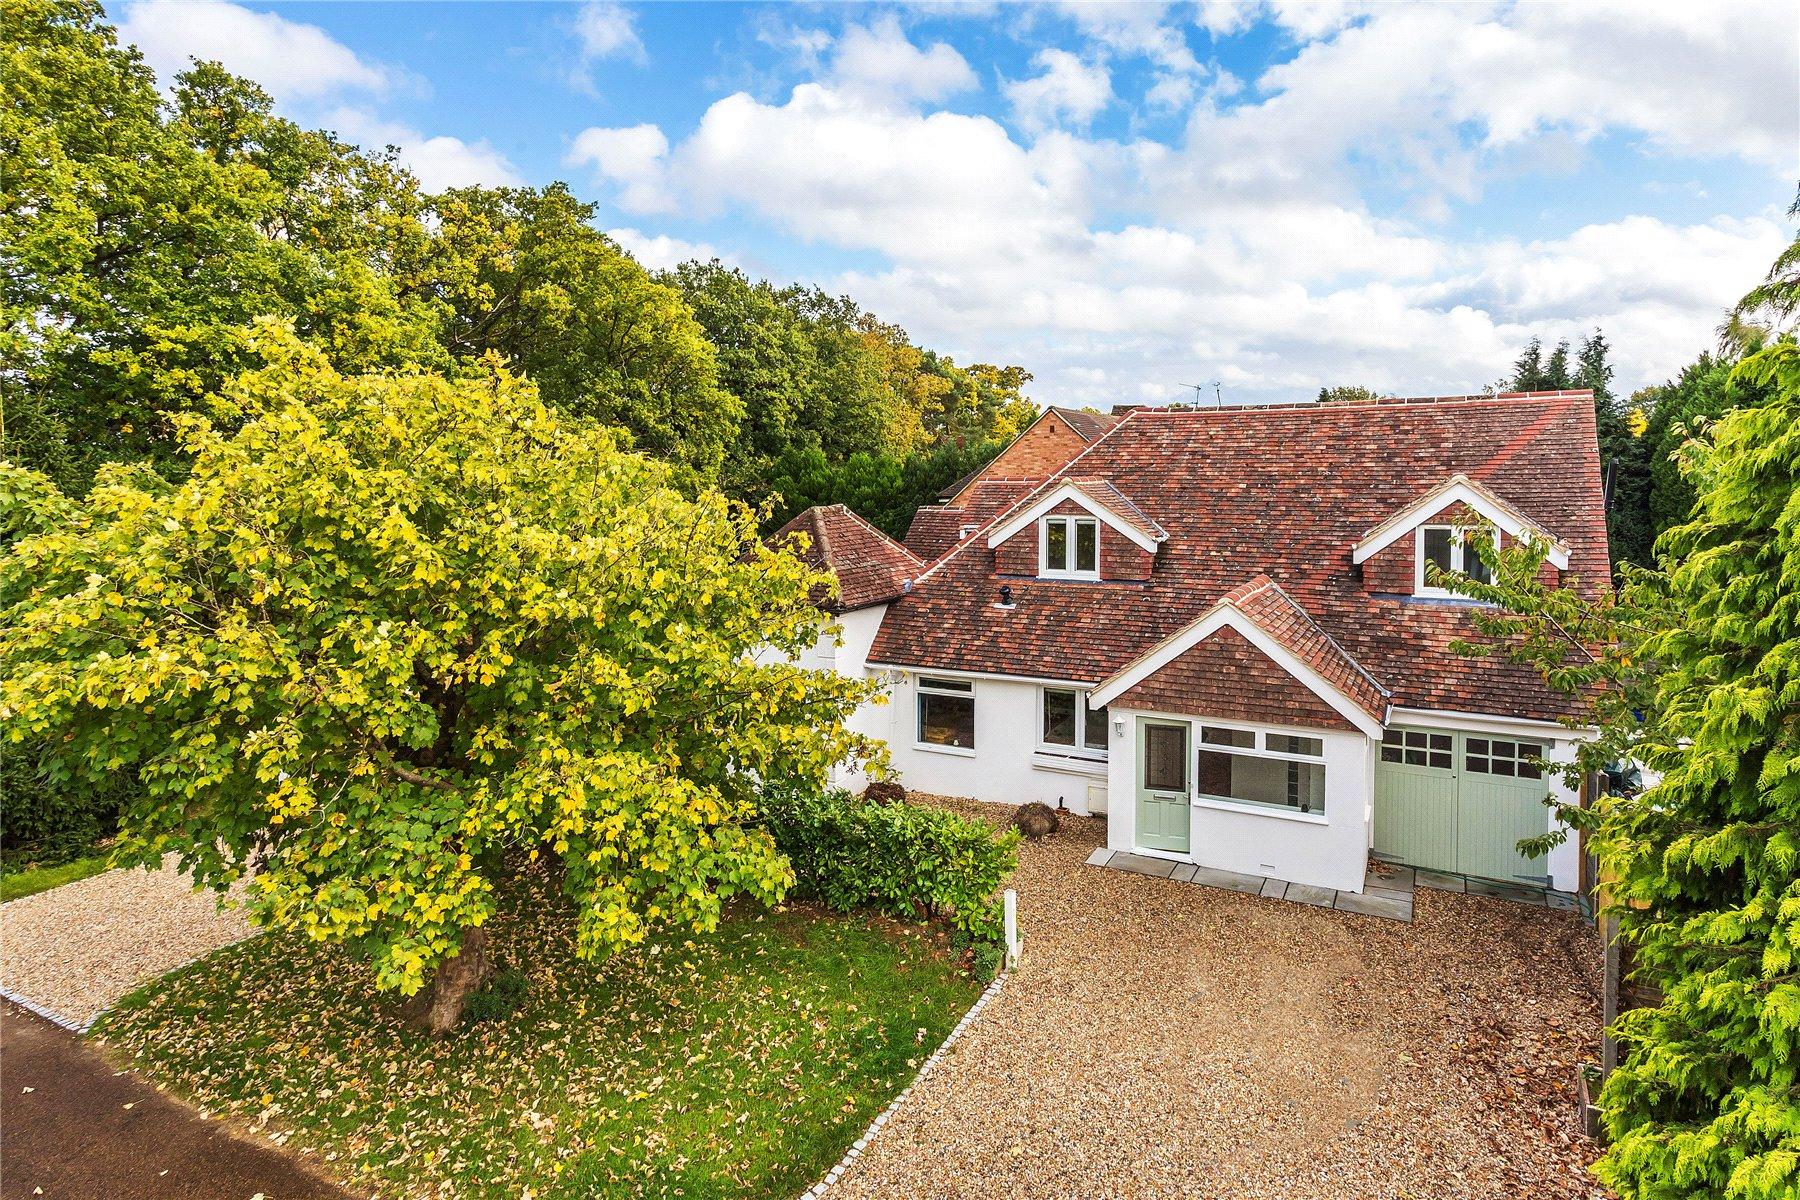 5 Bedrooms Detached House for sale in Sheerwater Avenue, Woodham, Surrey, KT15